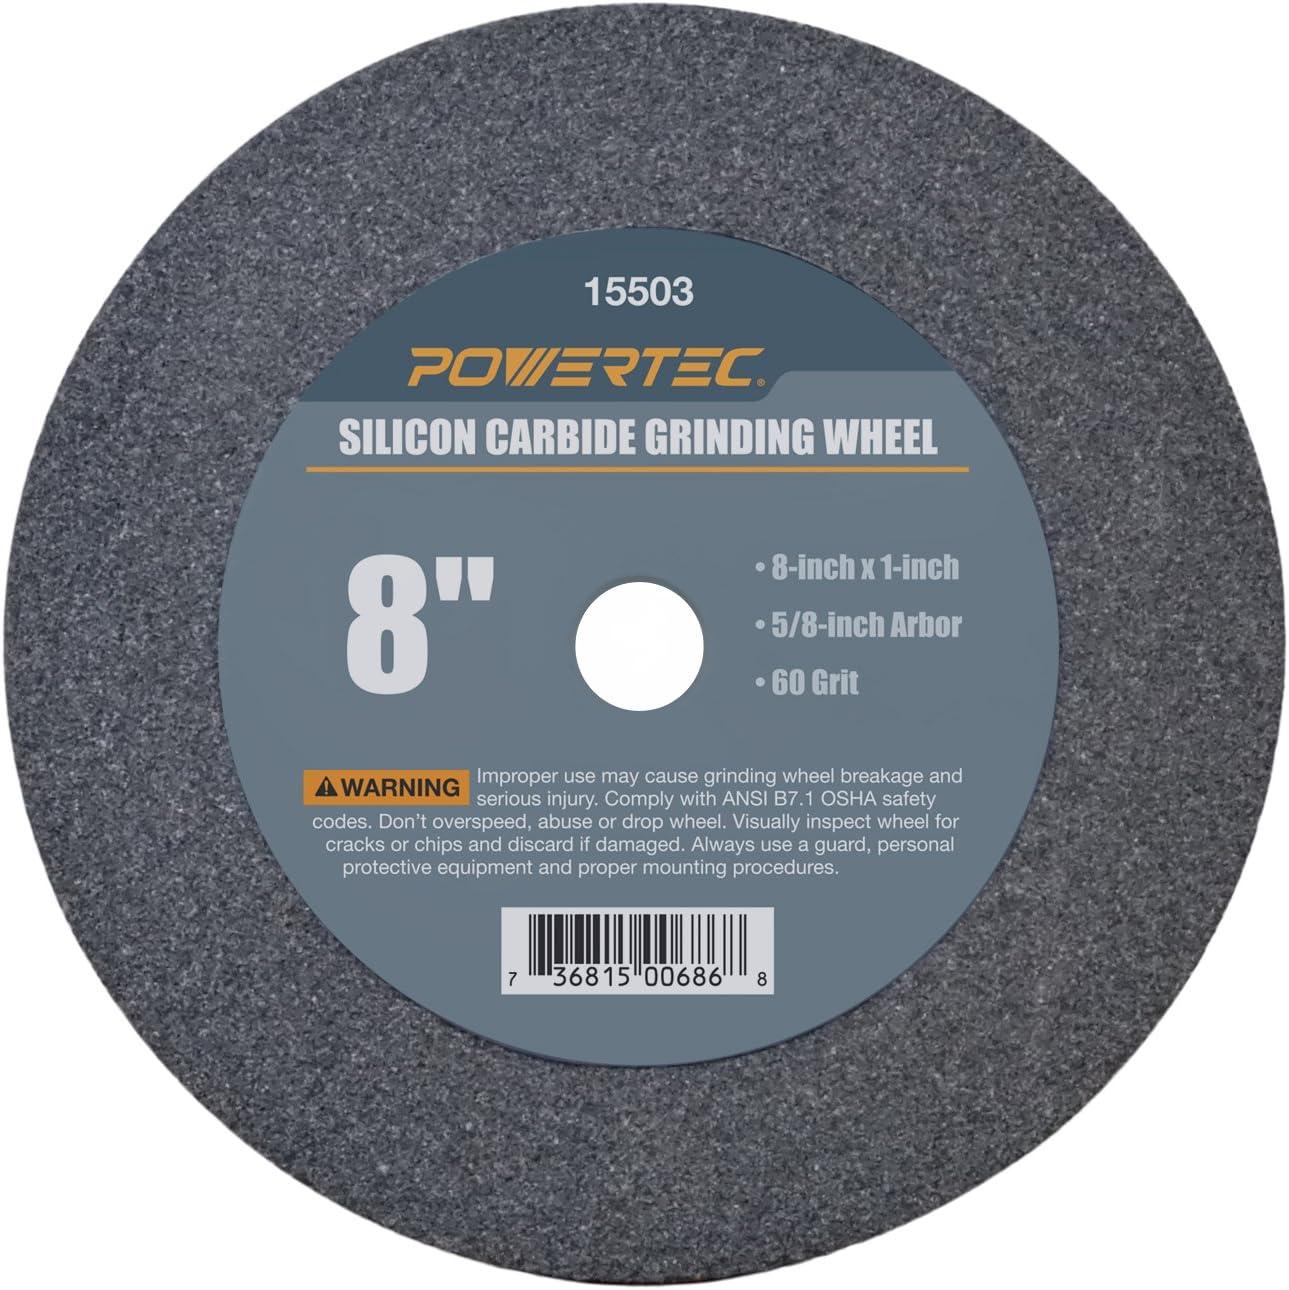 "POWERTEC 15503 5/8"" Arbor 60-Grit Silicon Carbide Grinding Wheel, 8"" x 1"""